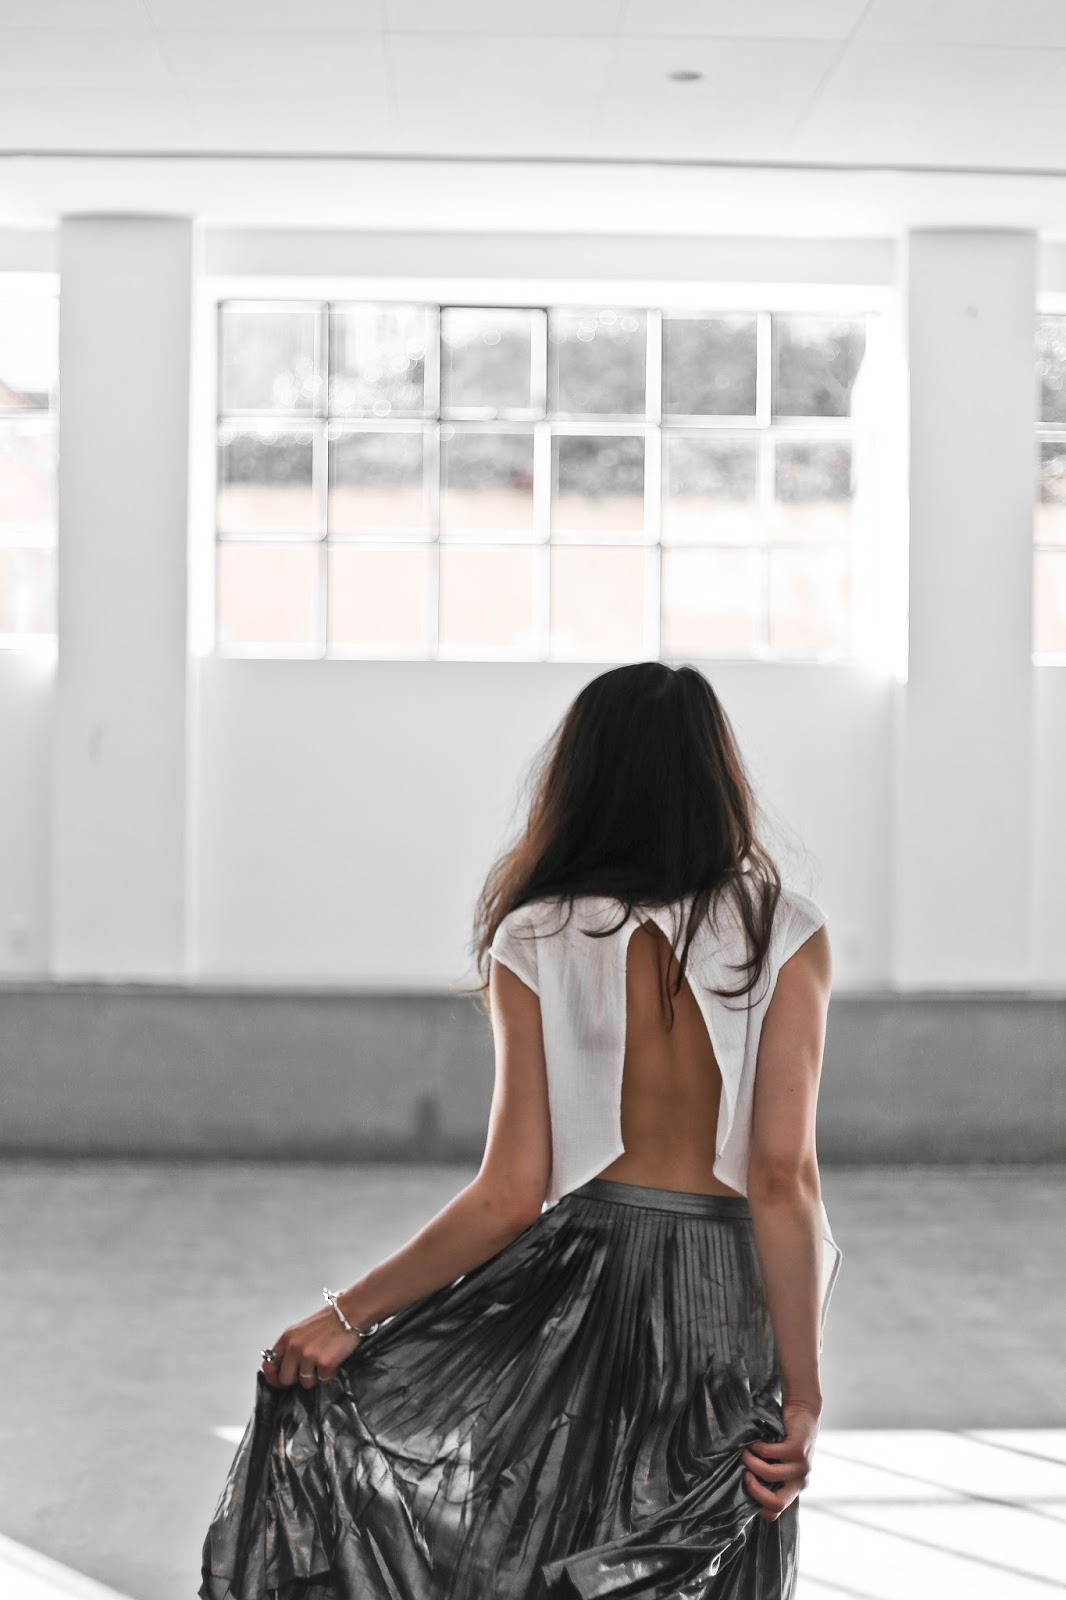 Skirt, top, third form top, maiko top, fashion blogger, blogger, danish fashion blogger, pleated skirt, high neck top